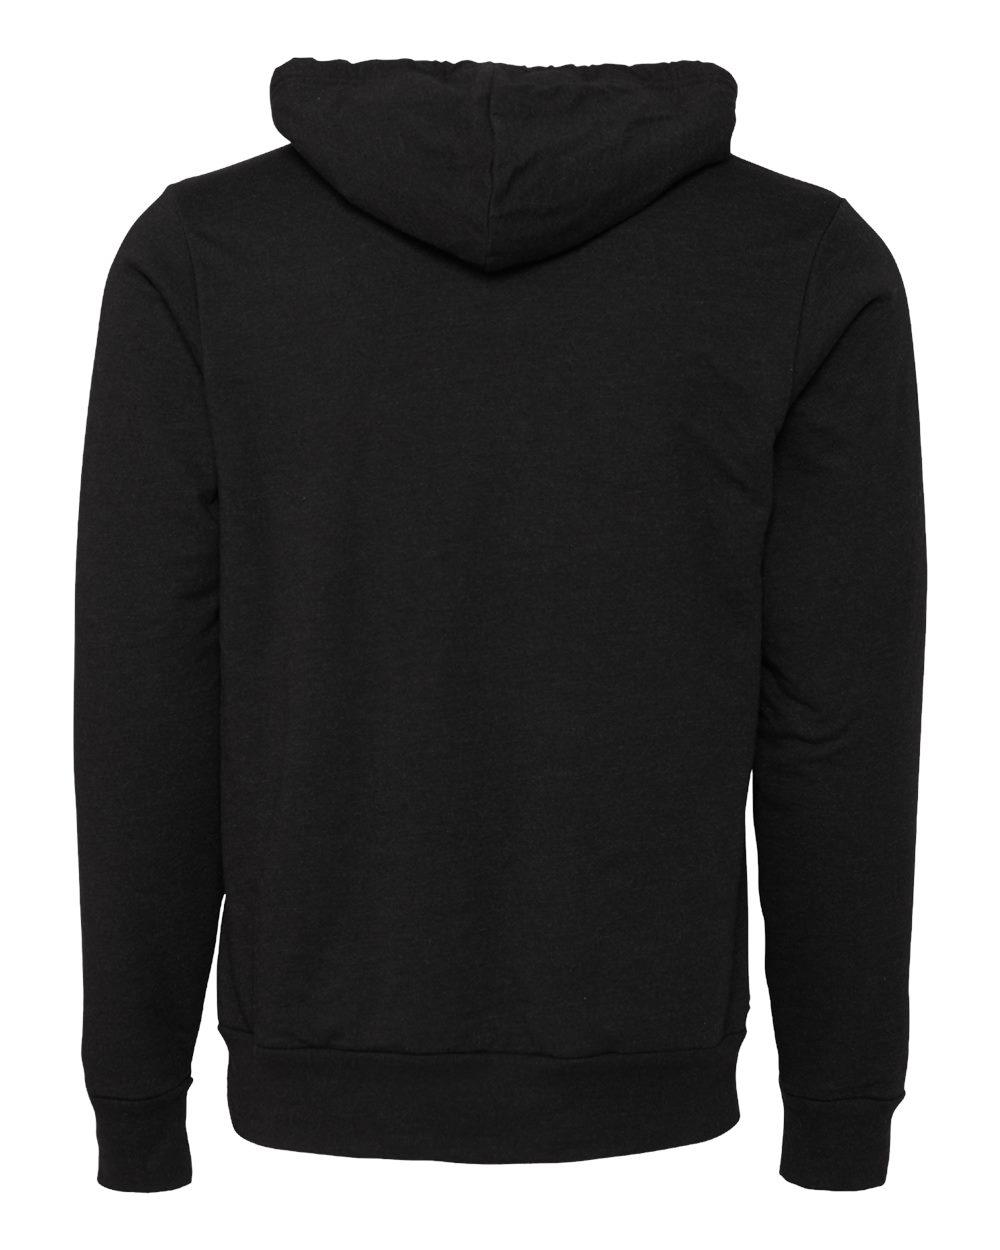 Bella-Canvas-Unisex-Sponge-Hooded-Pullover-Sweatshirt-Blank-3719-up-to-2XL thumbnail 14